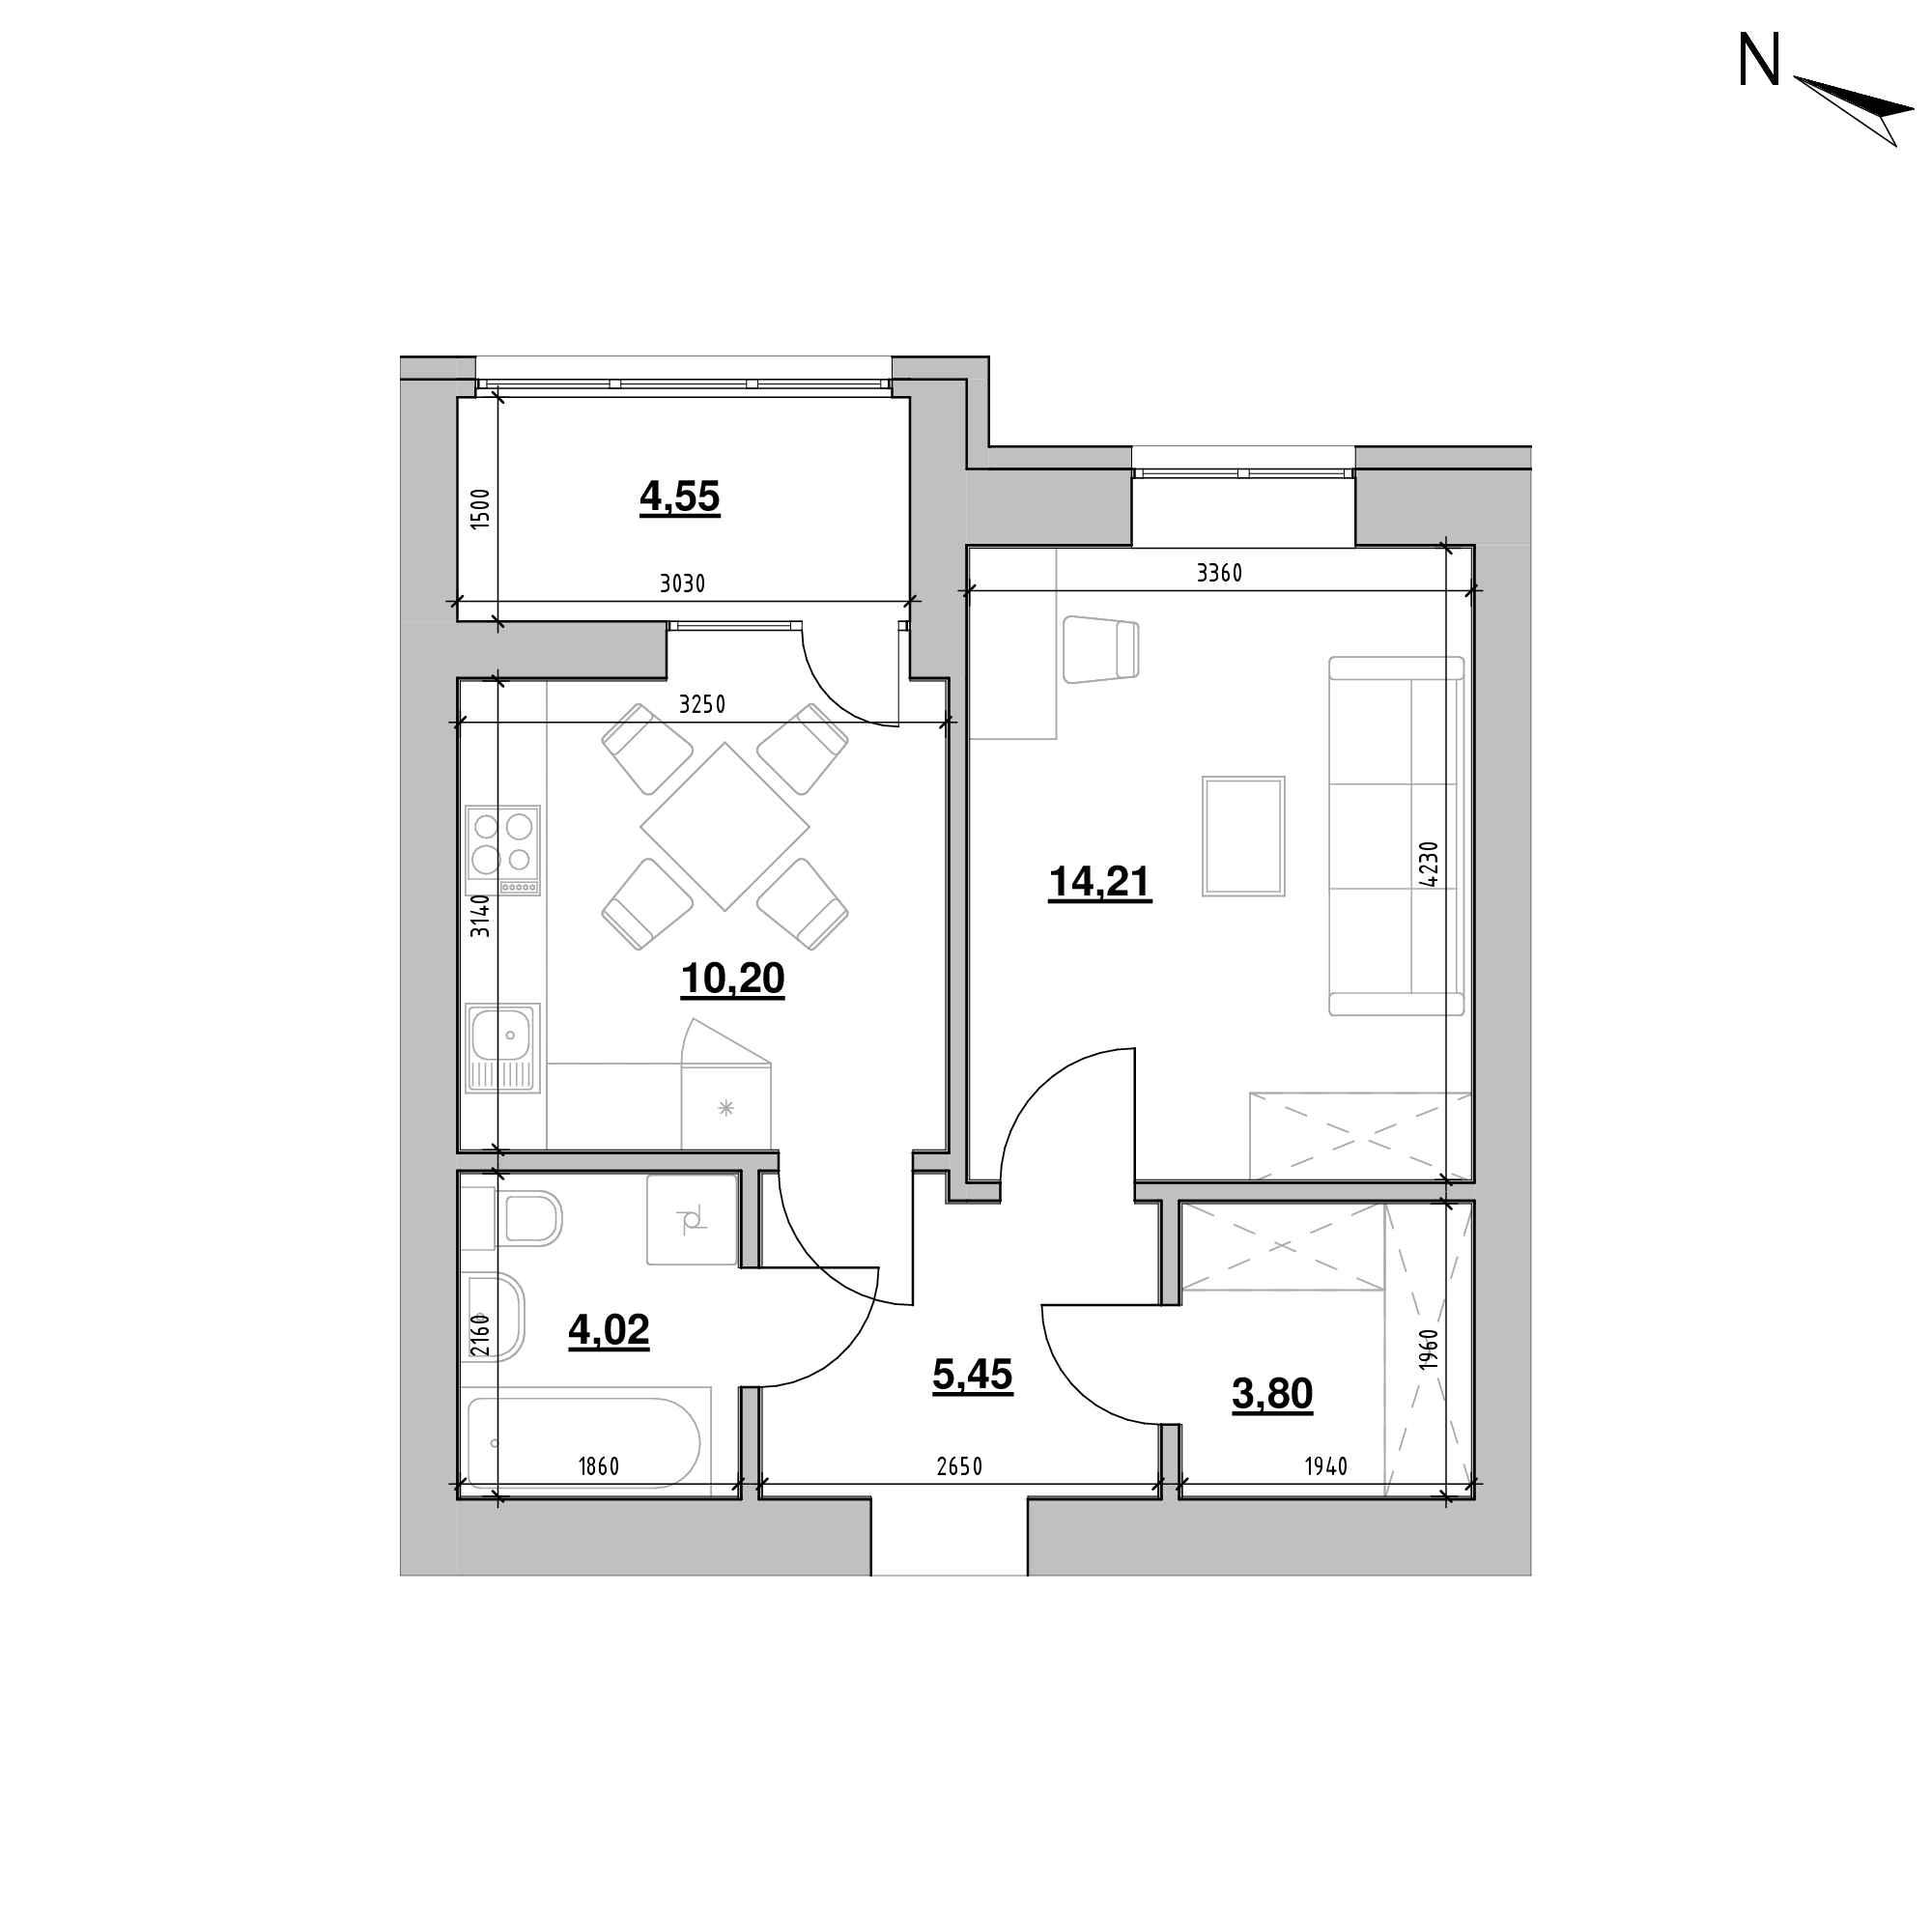 ЖК Шенген: планування 1-кімнатної квартири, №13, 42.23 м<sup>2</sup>